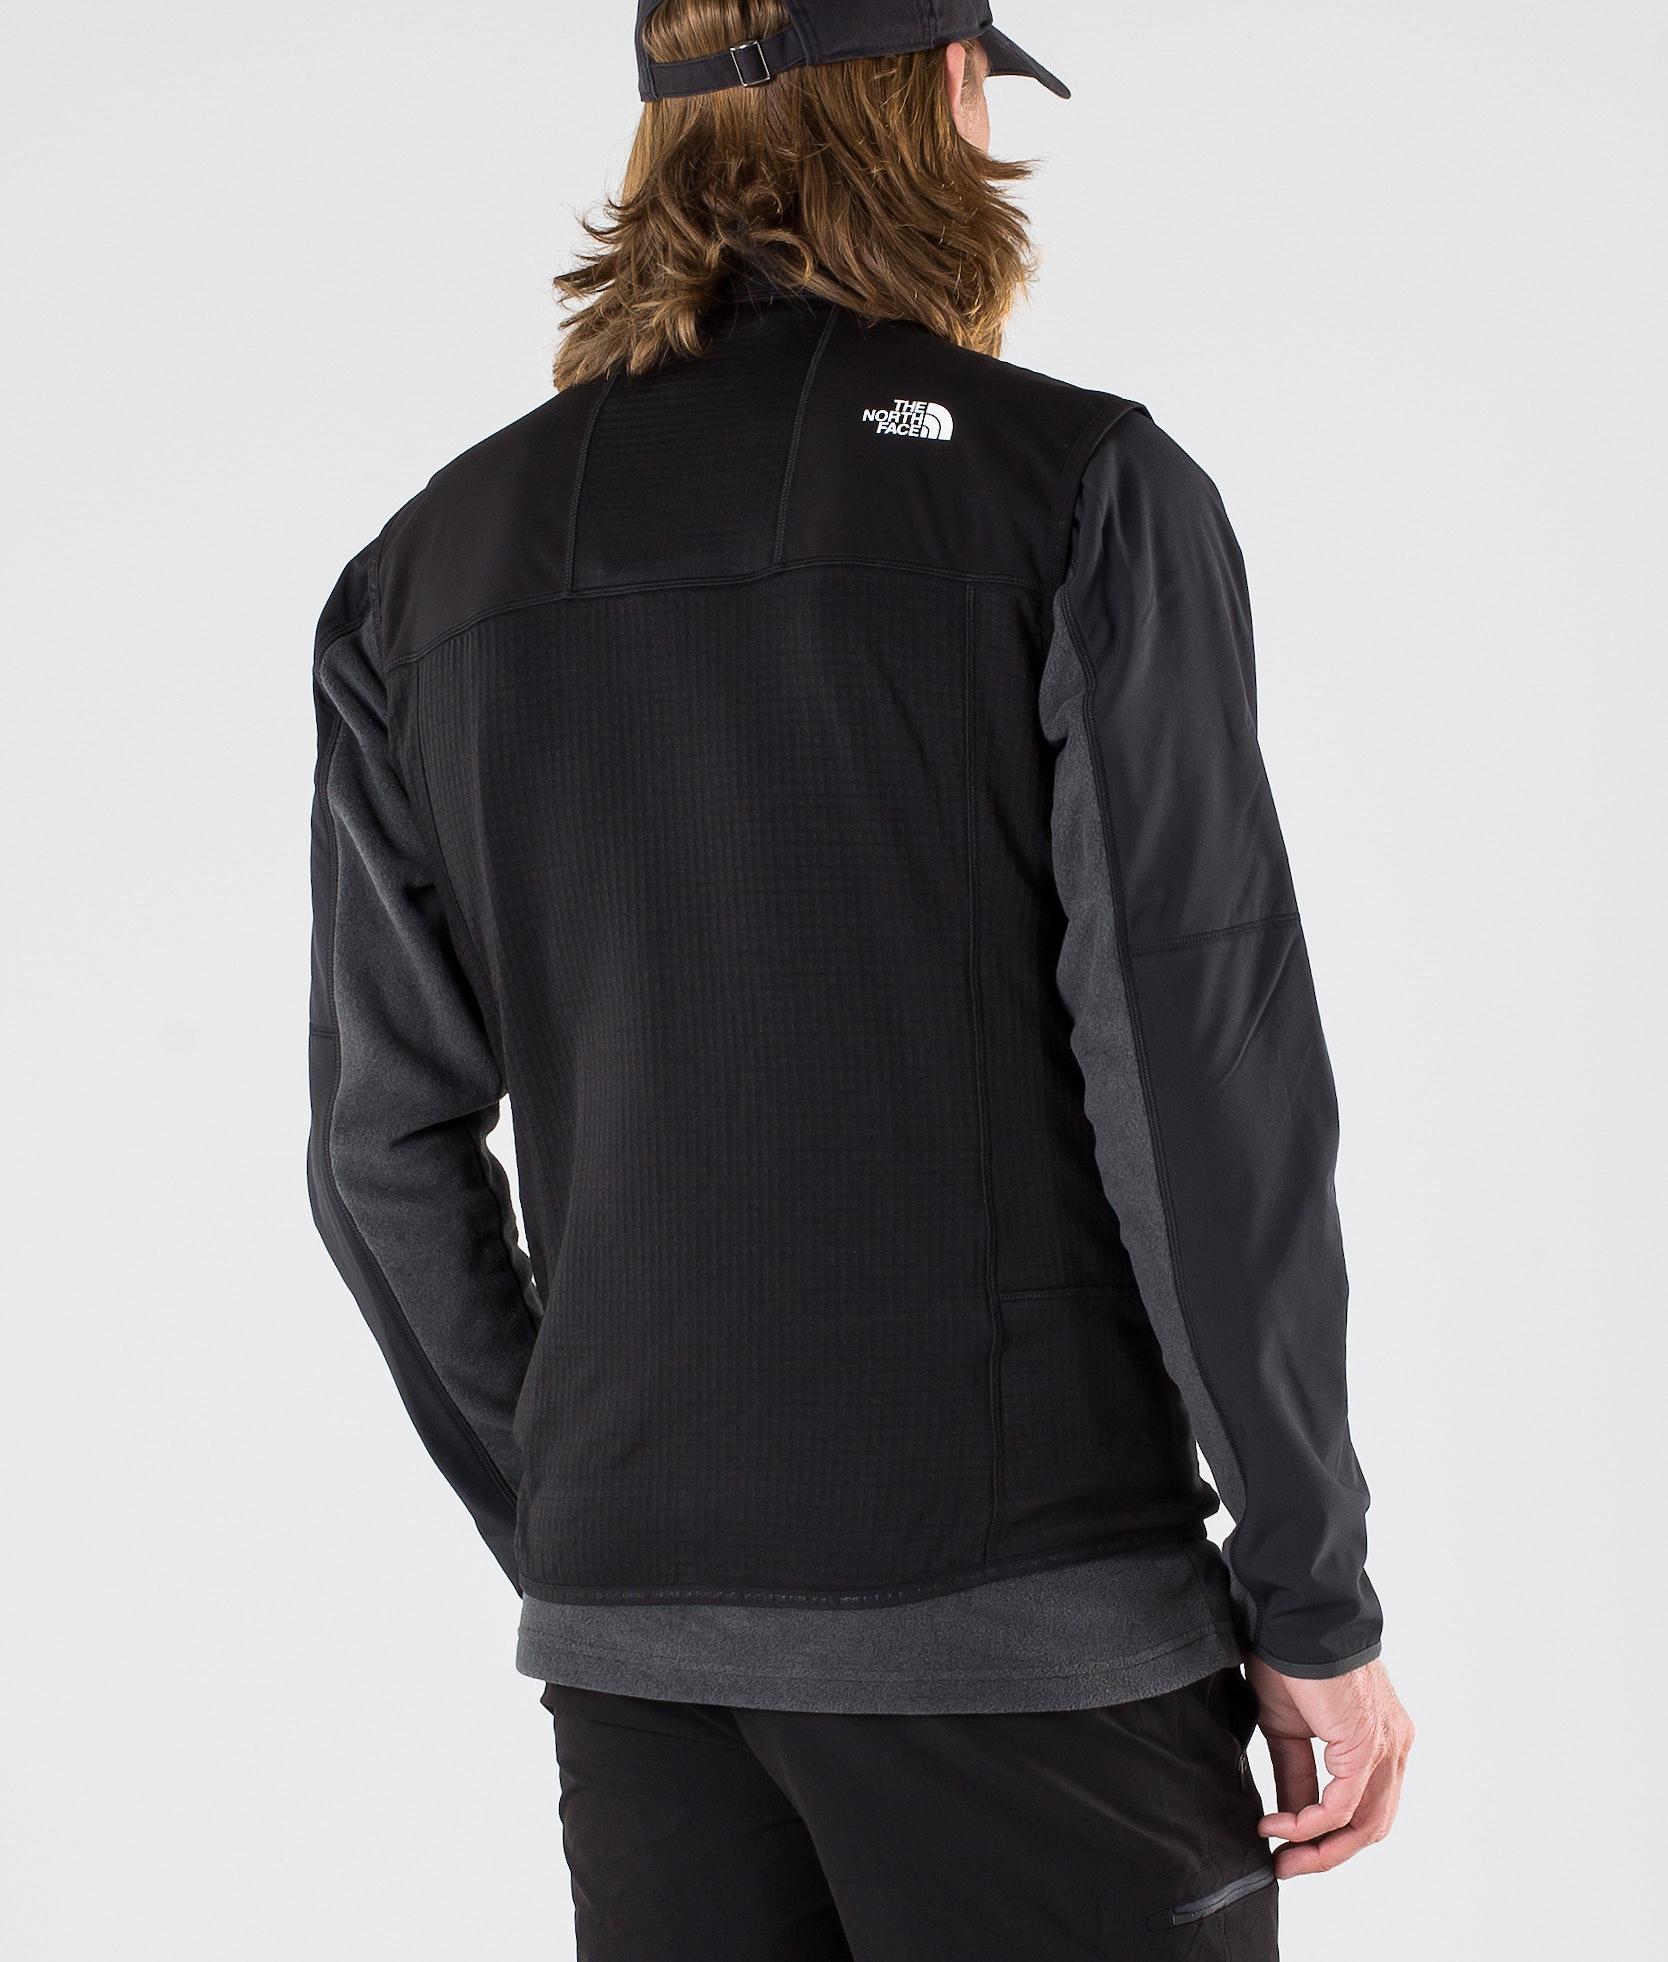 90fa7f3c0 The North Face Hybrid Softshell V Outdoor Jacket Tnf Black/Tnf Black